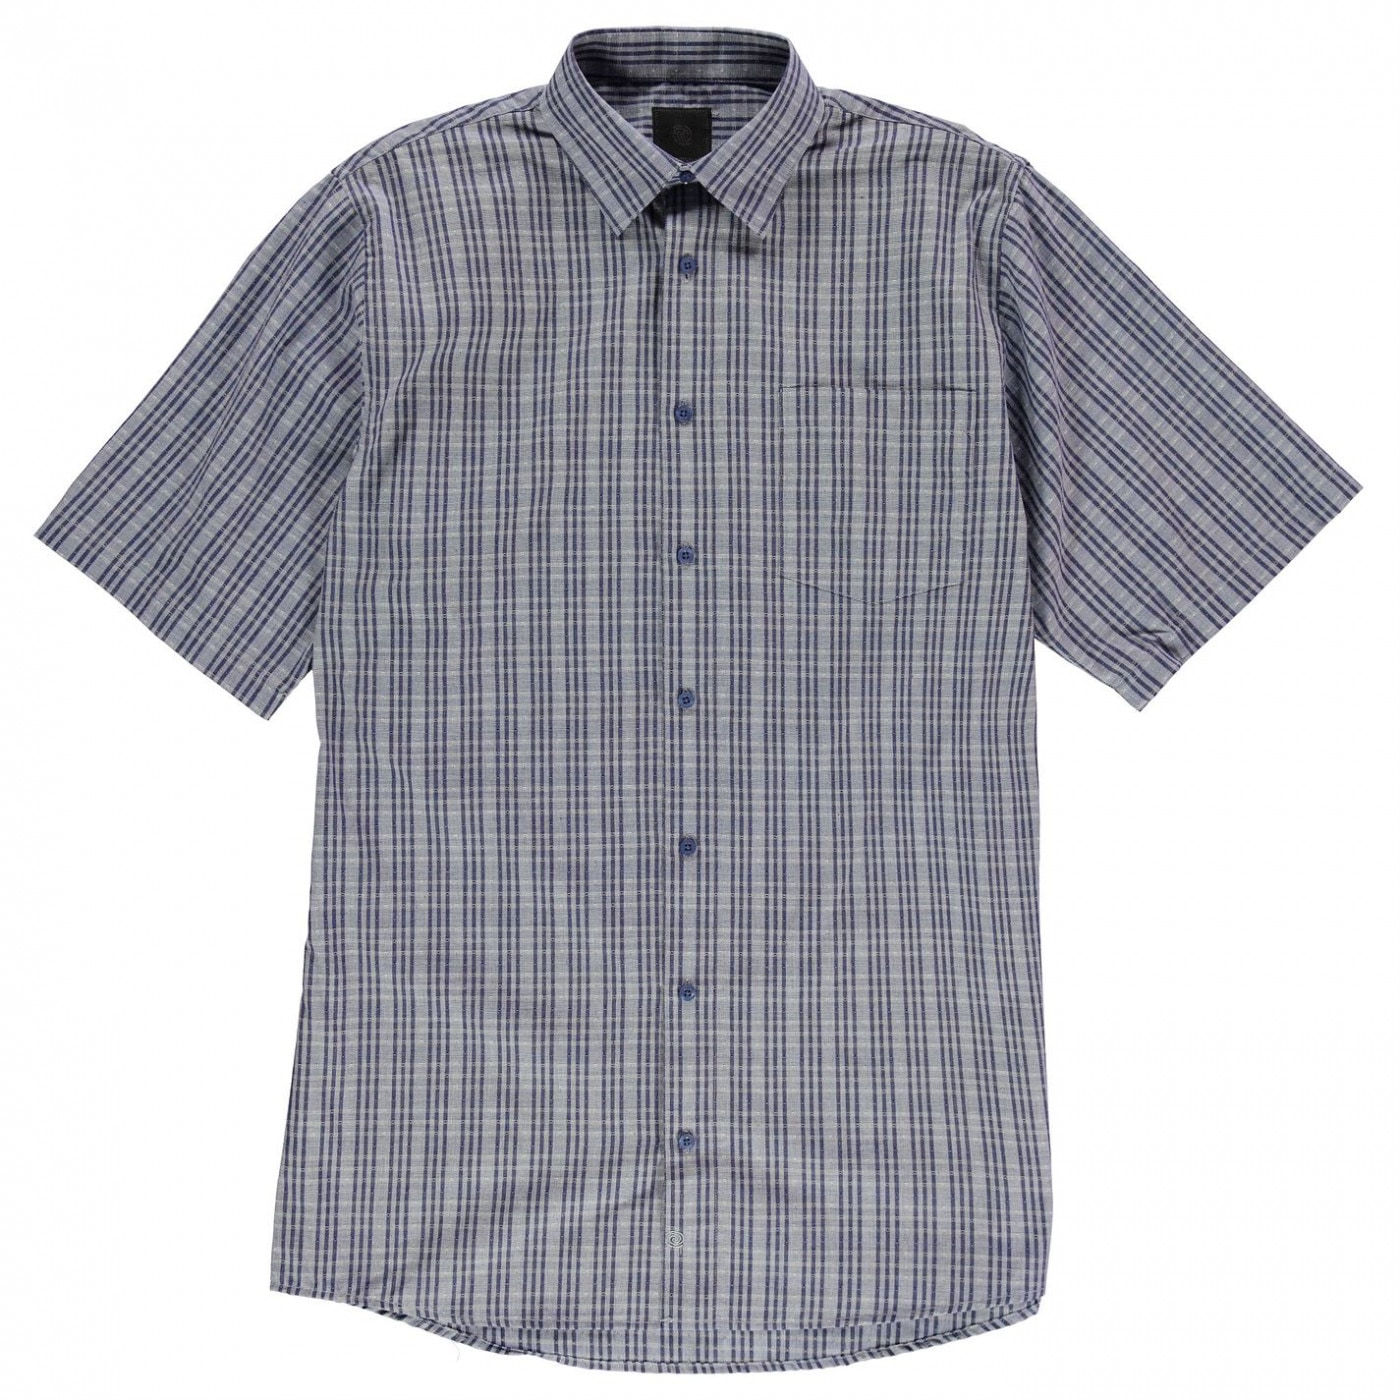 Fusion Textured Dobie Overplaid Shirt Mens